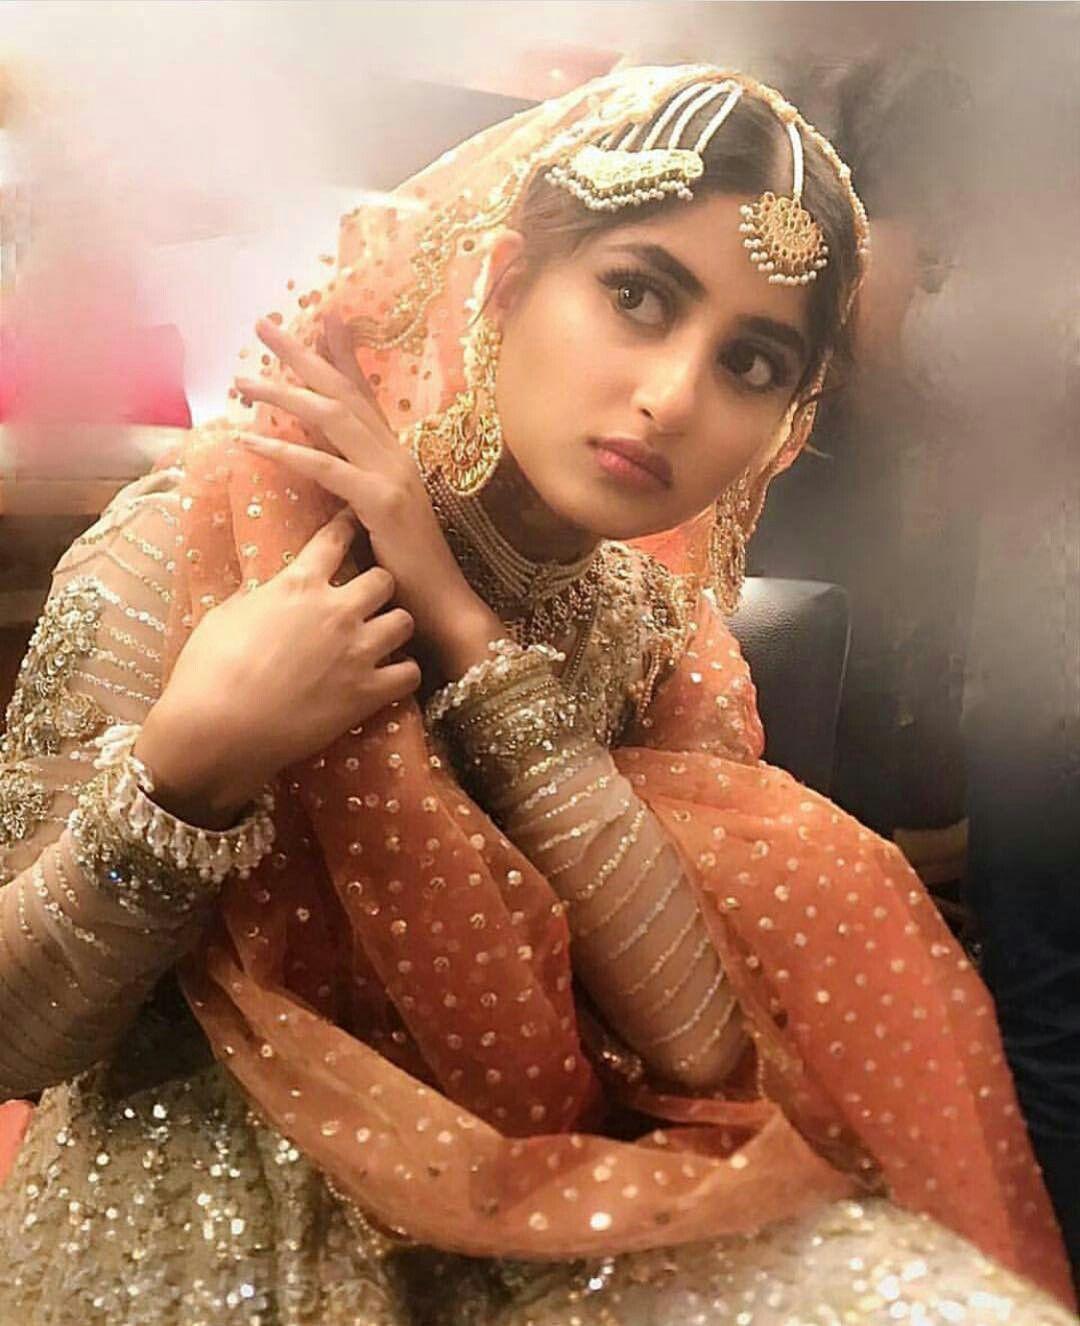 Best 25+ Sajal ali wedding ideas on Pinterest | Sajal ali